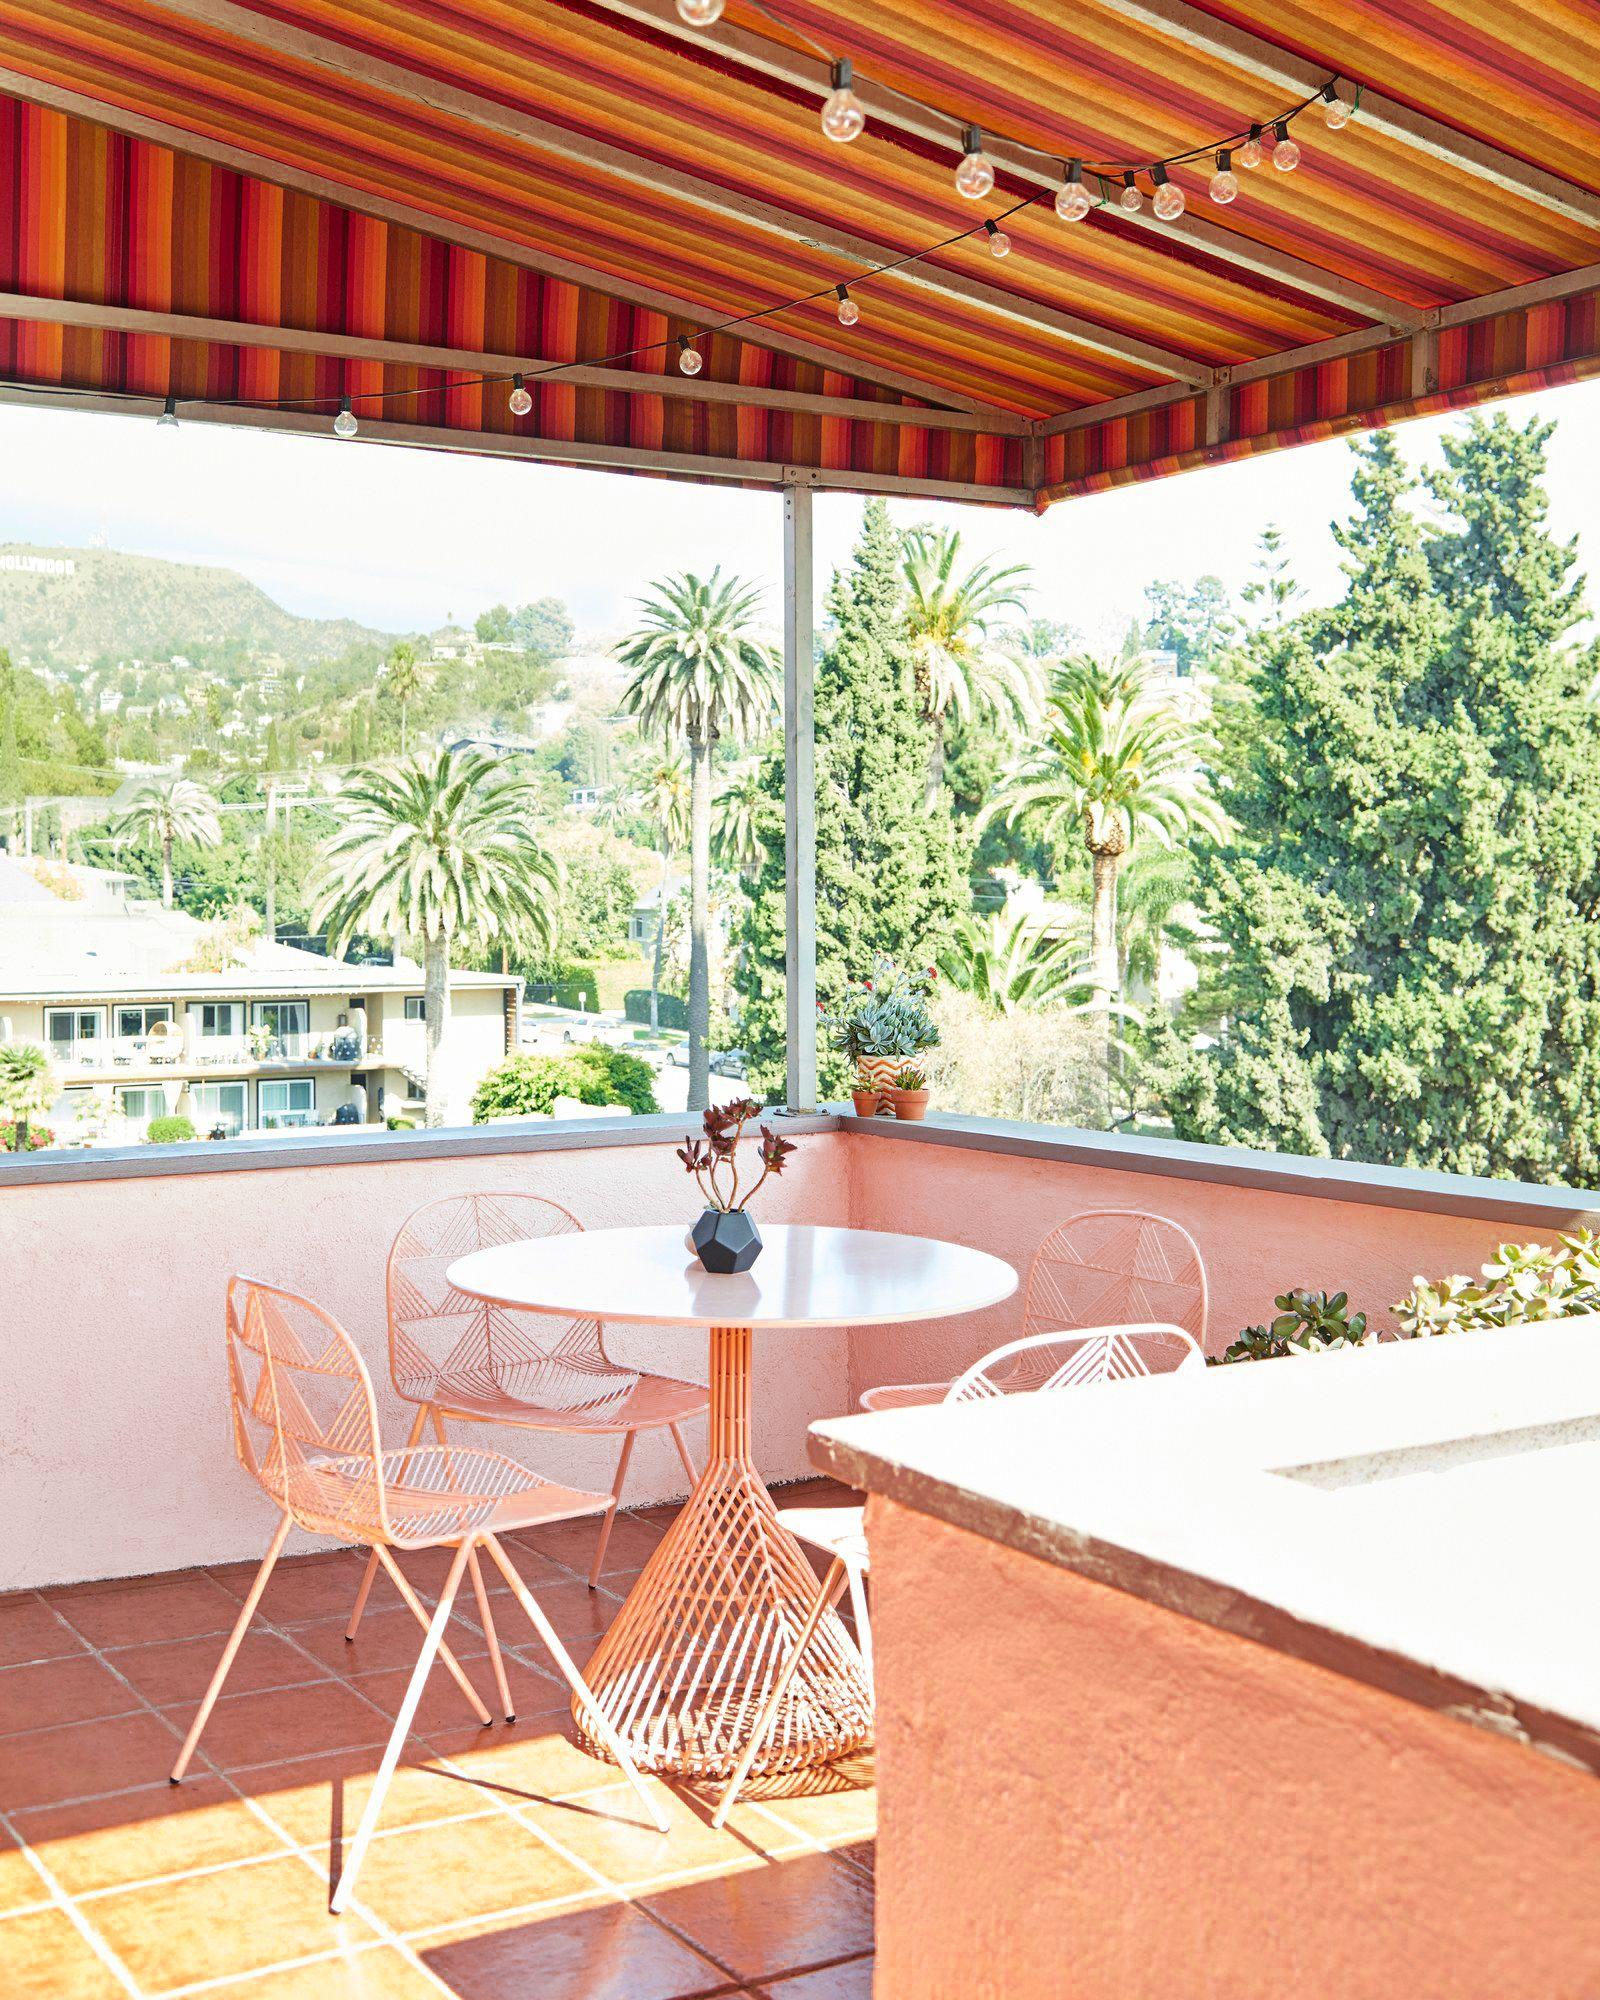 17 apartment patio ideas to create an